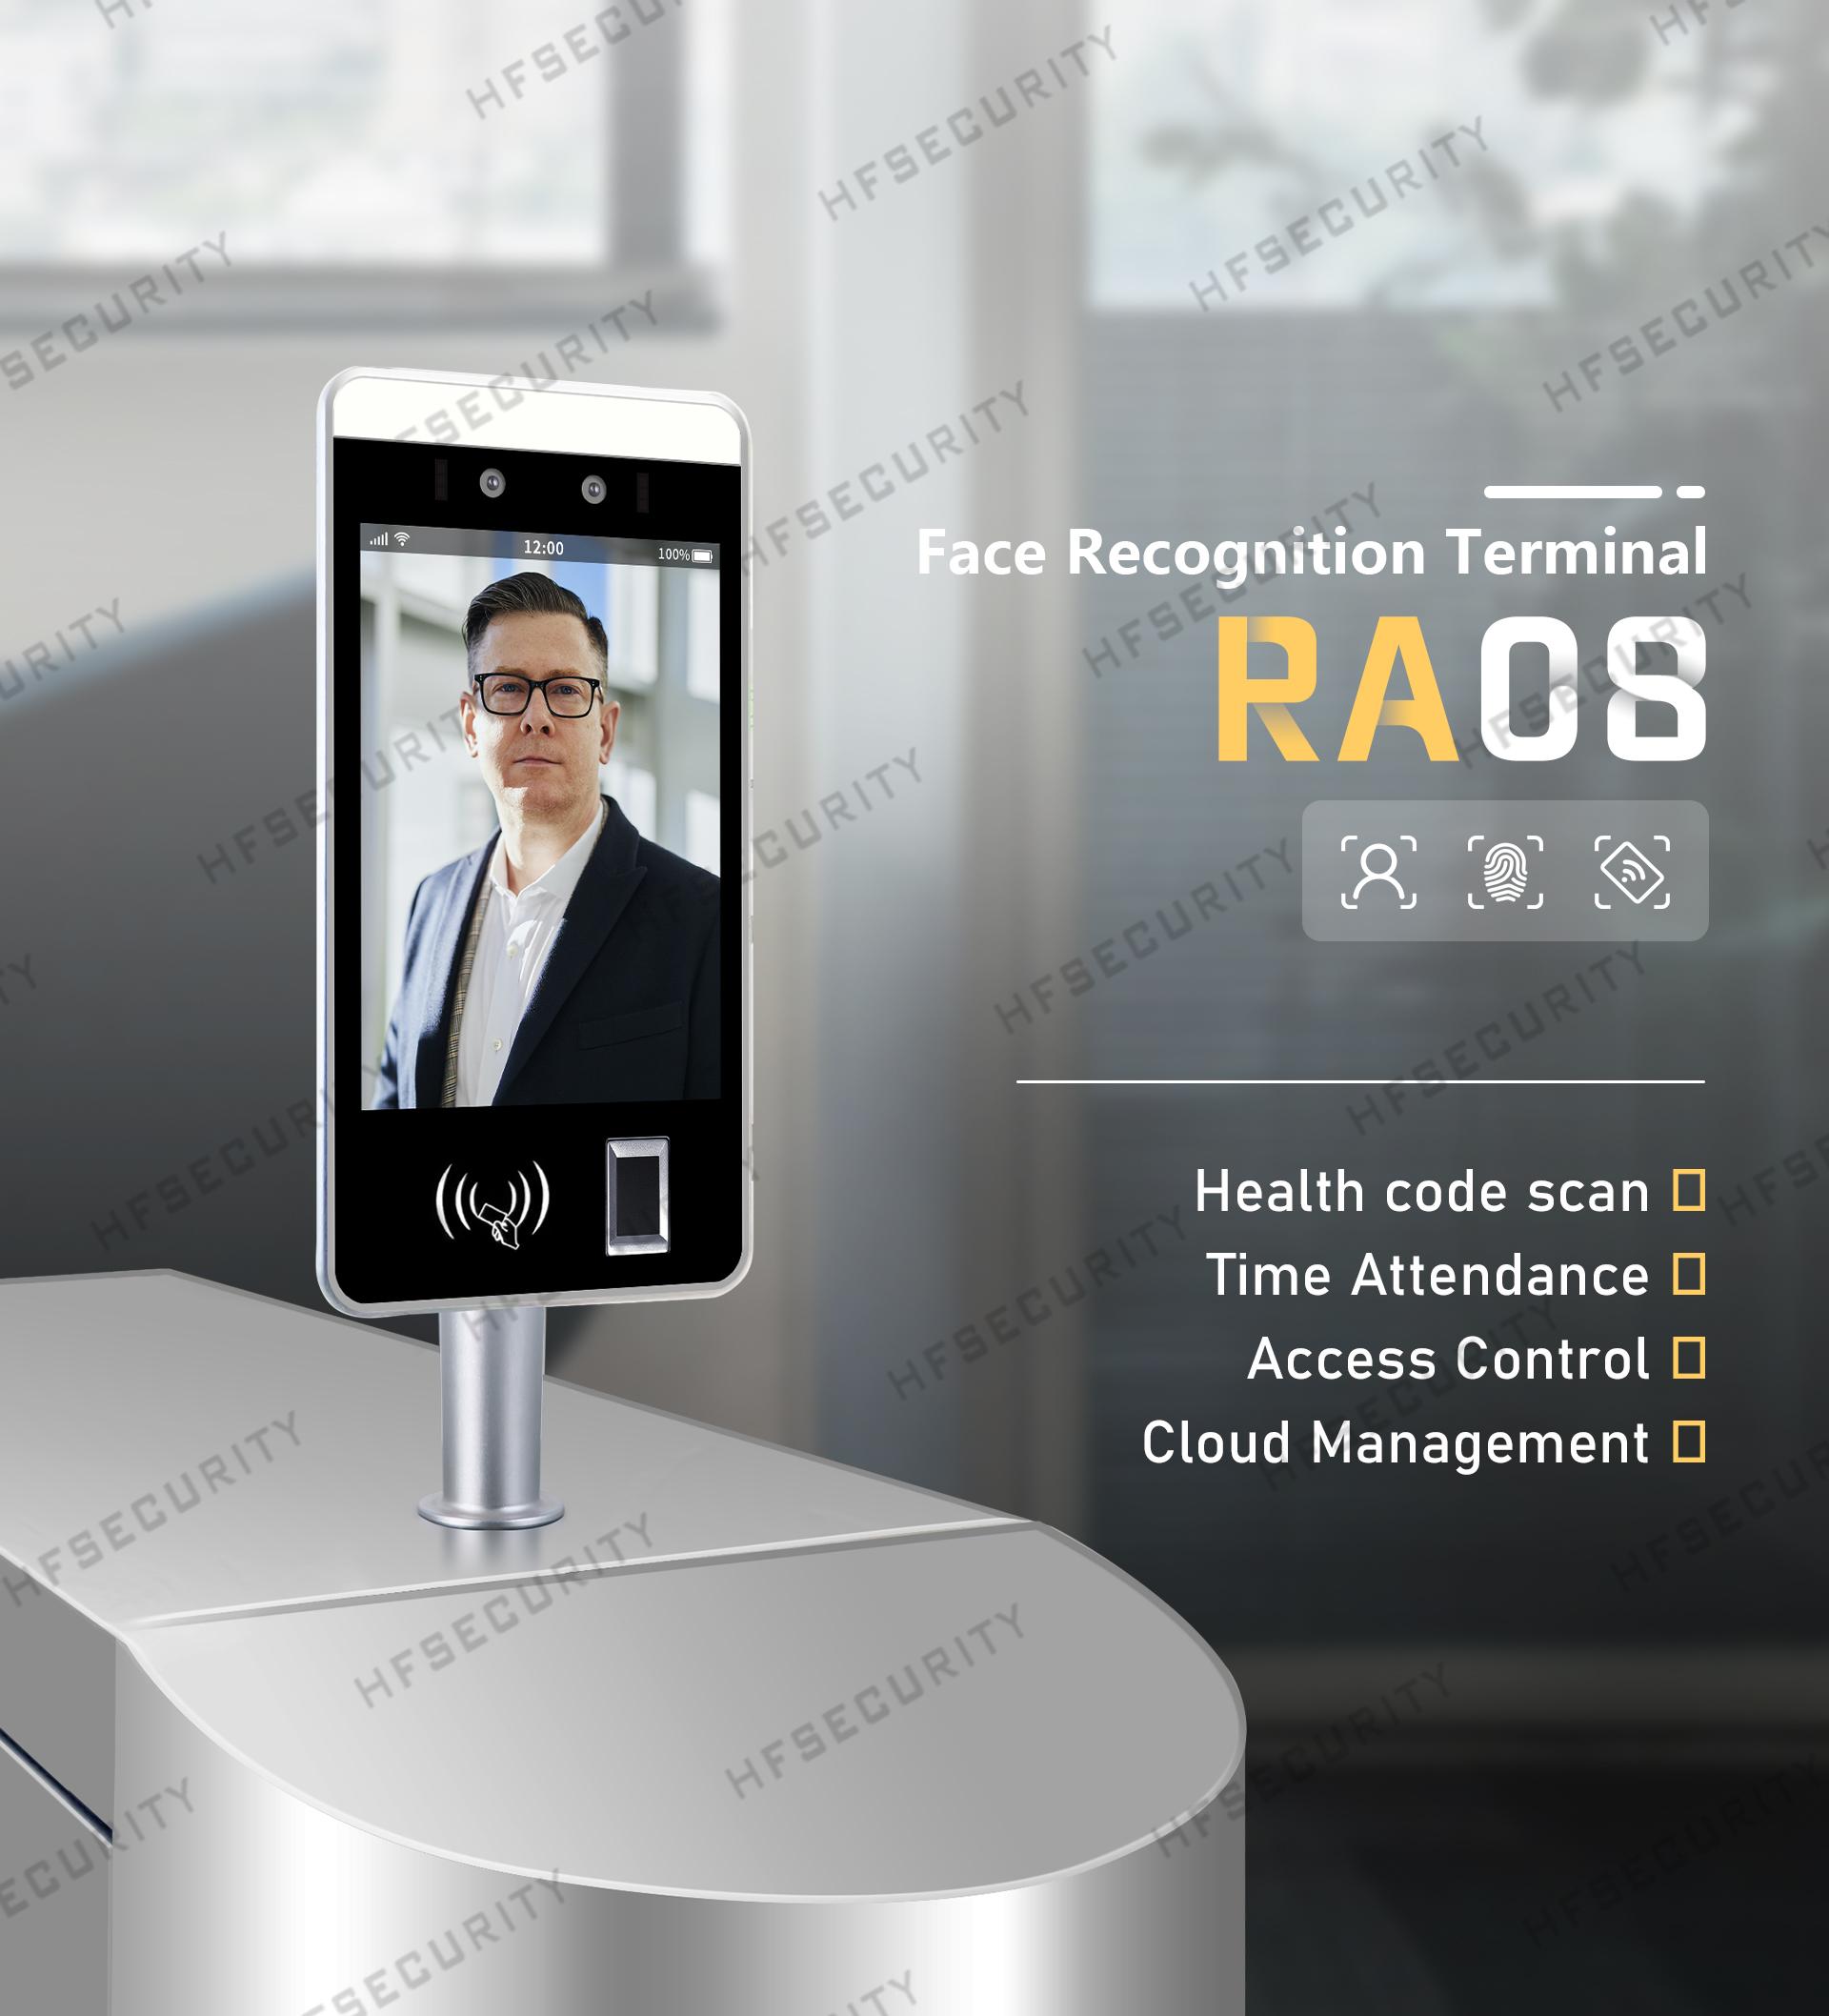 HFSecurity RA08 Face Fingerprint Recognition Device